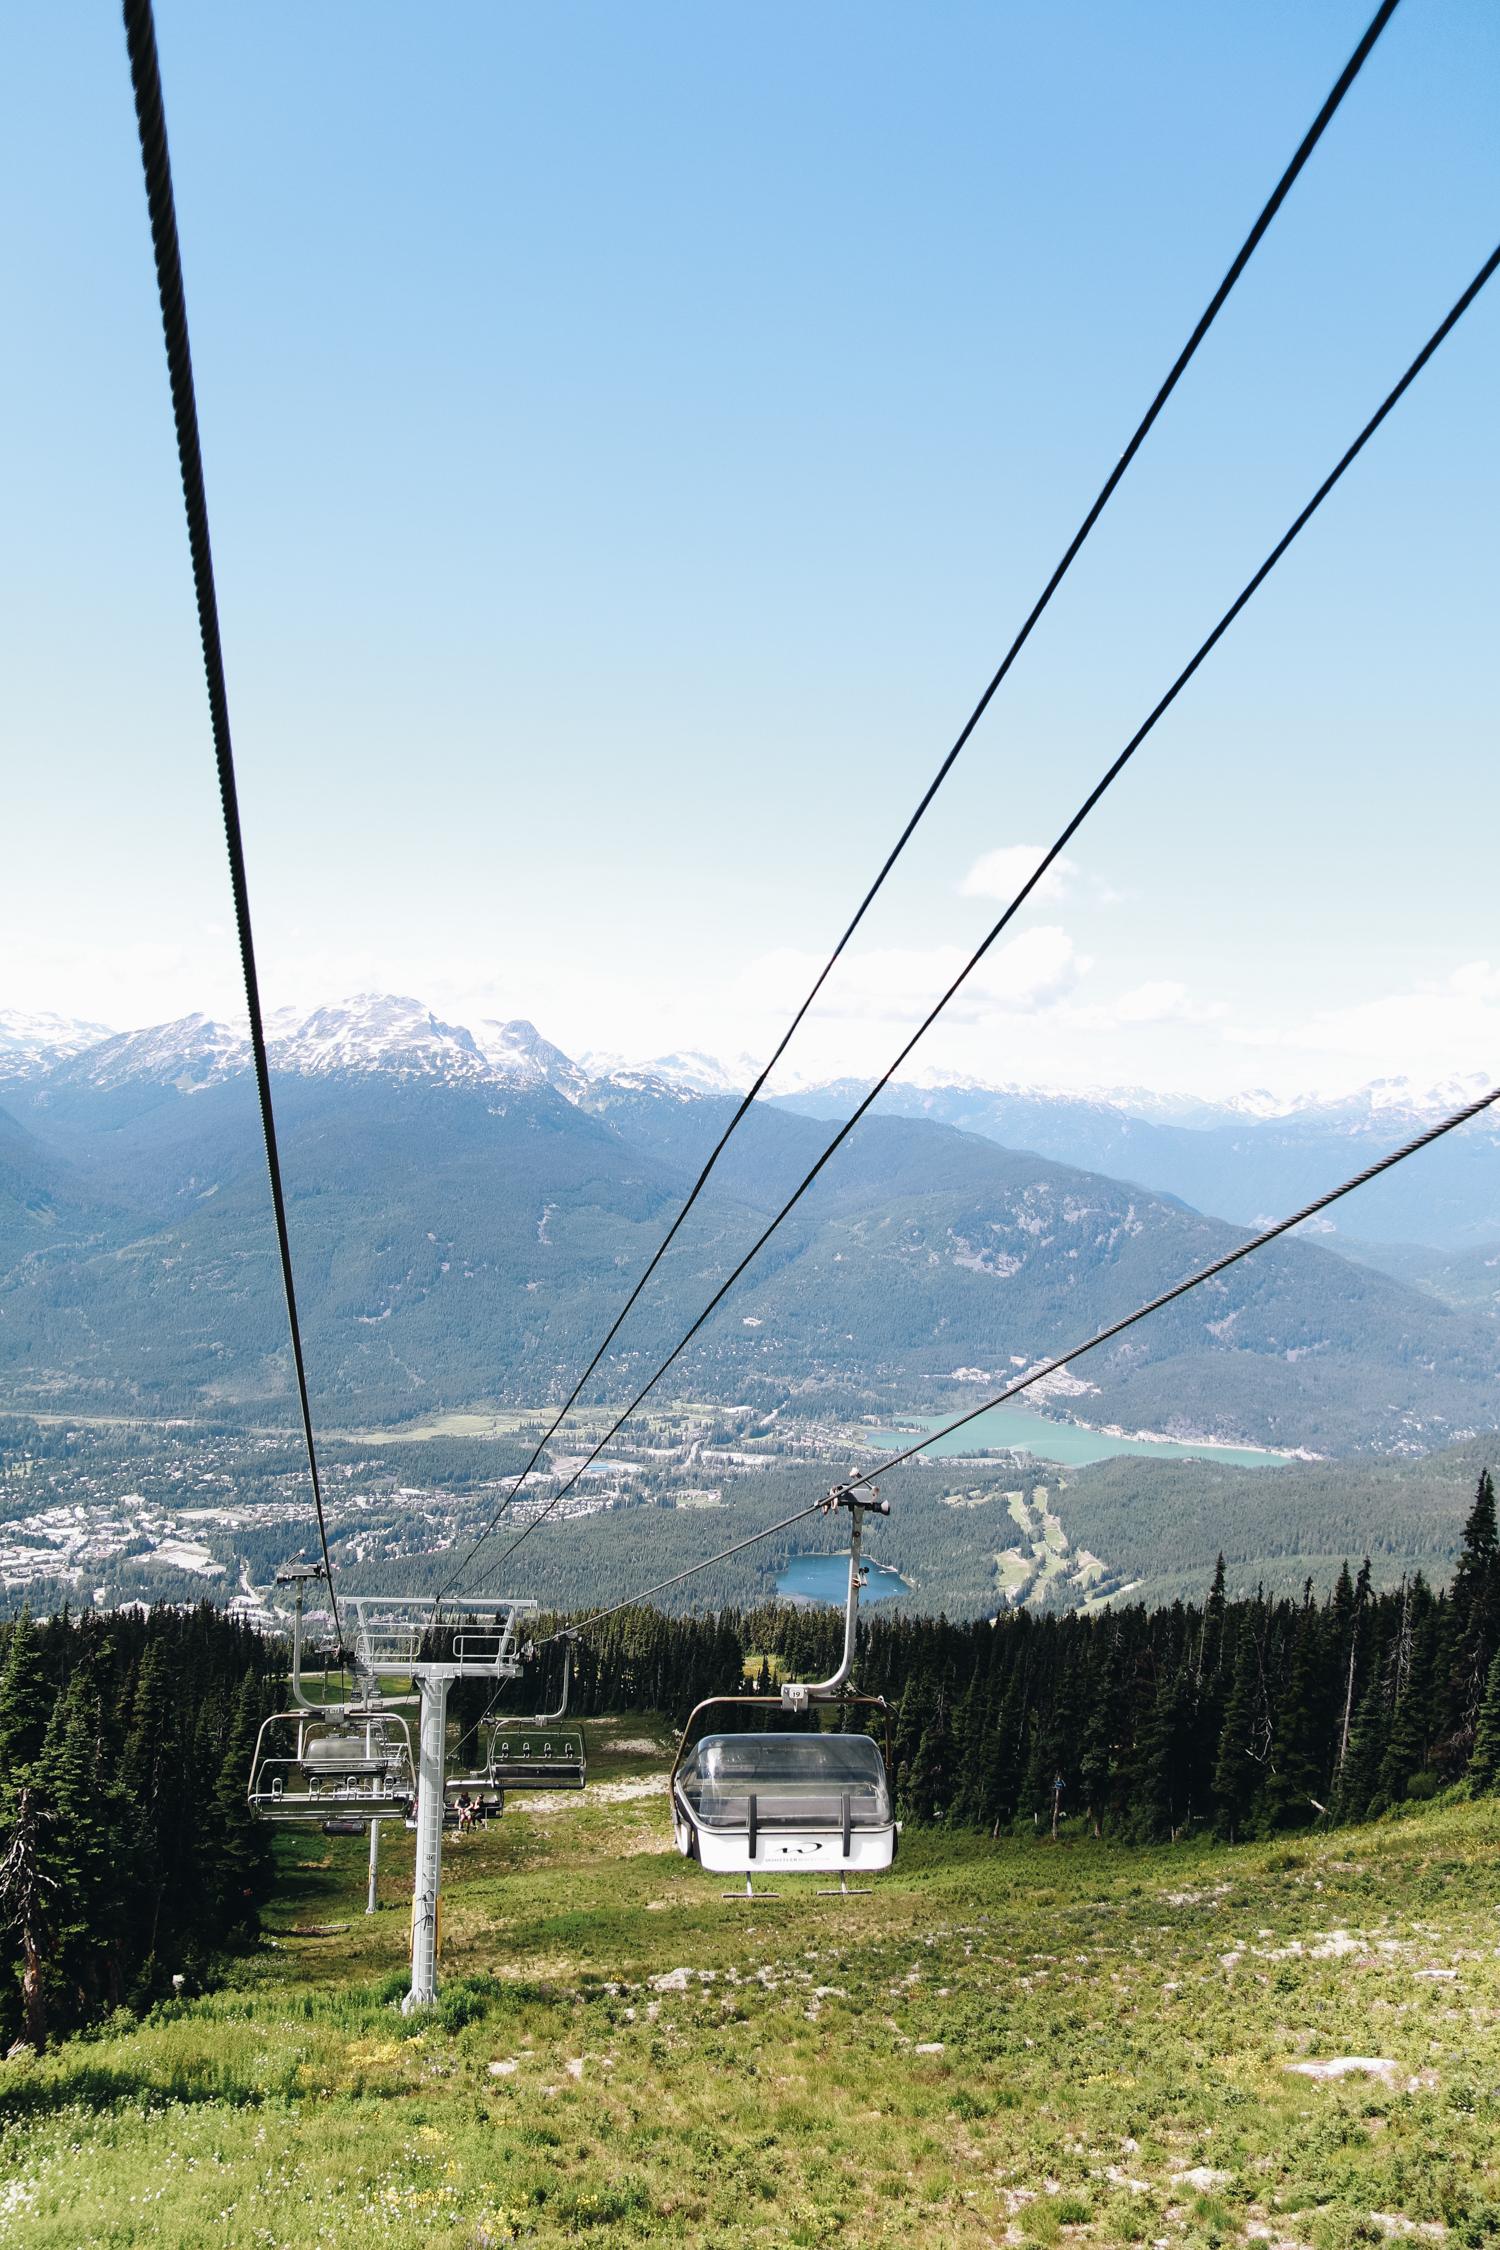 peak 2 peak gondola 24 hours in whistler